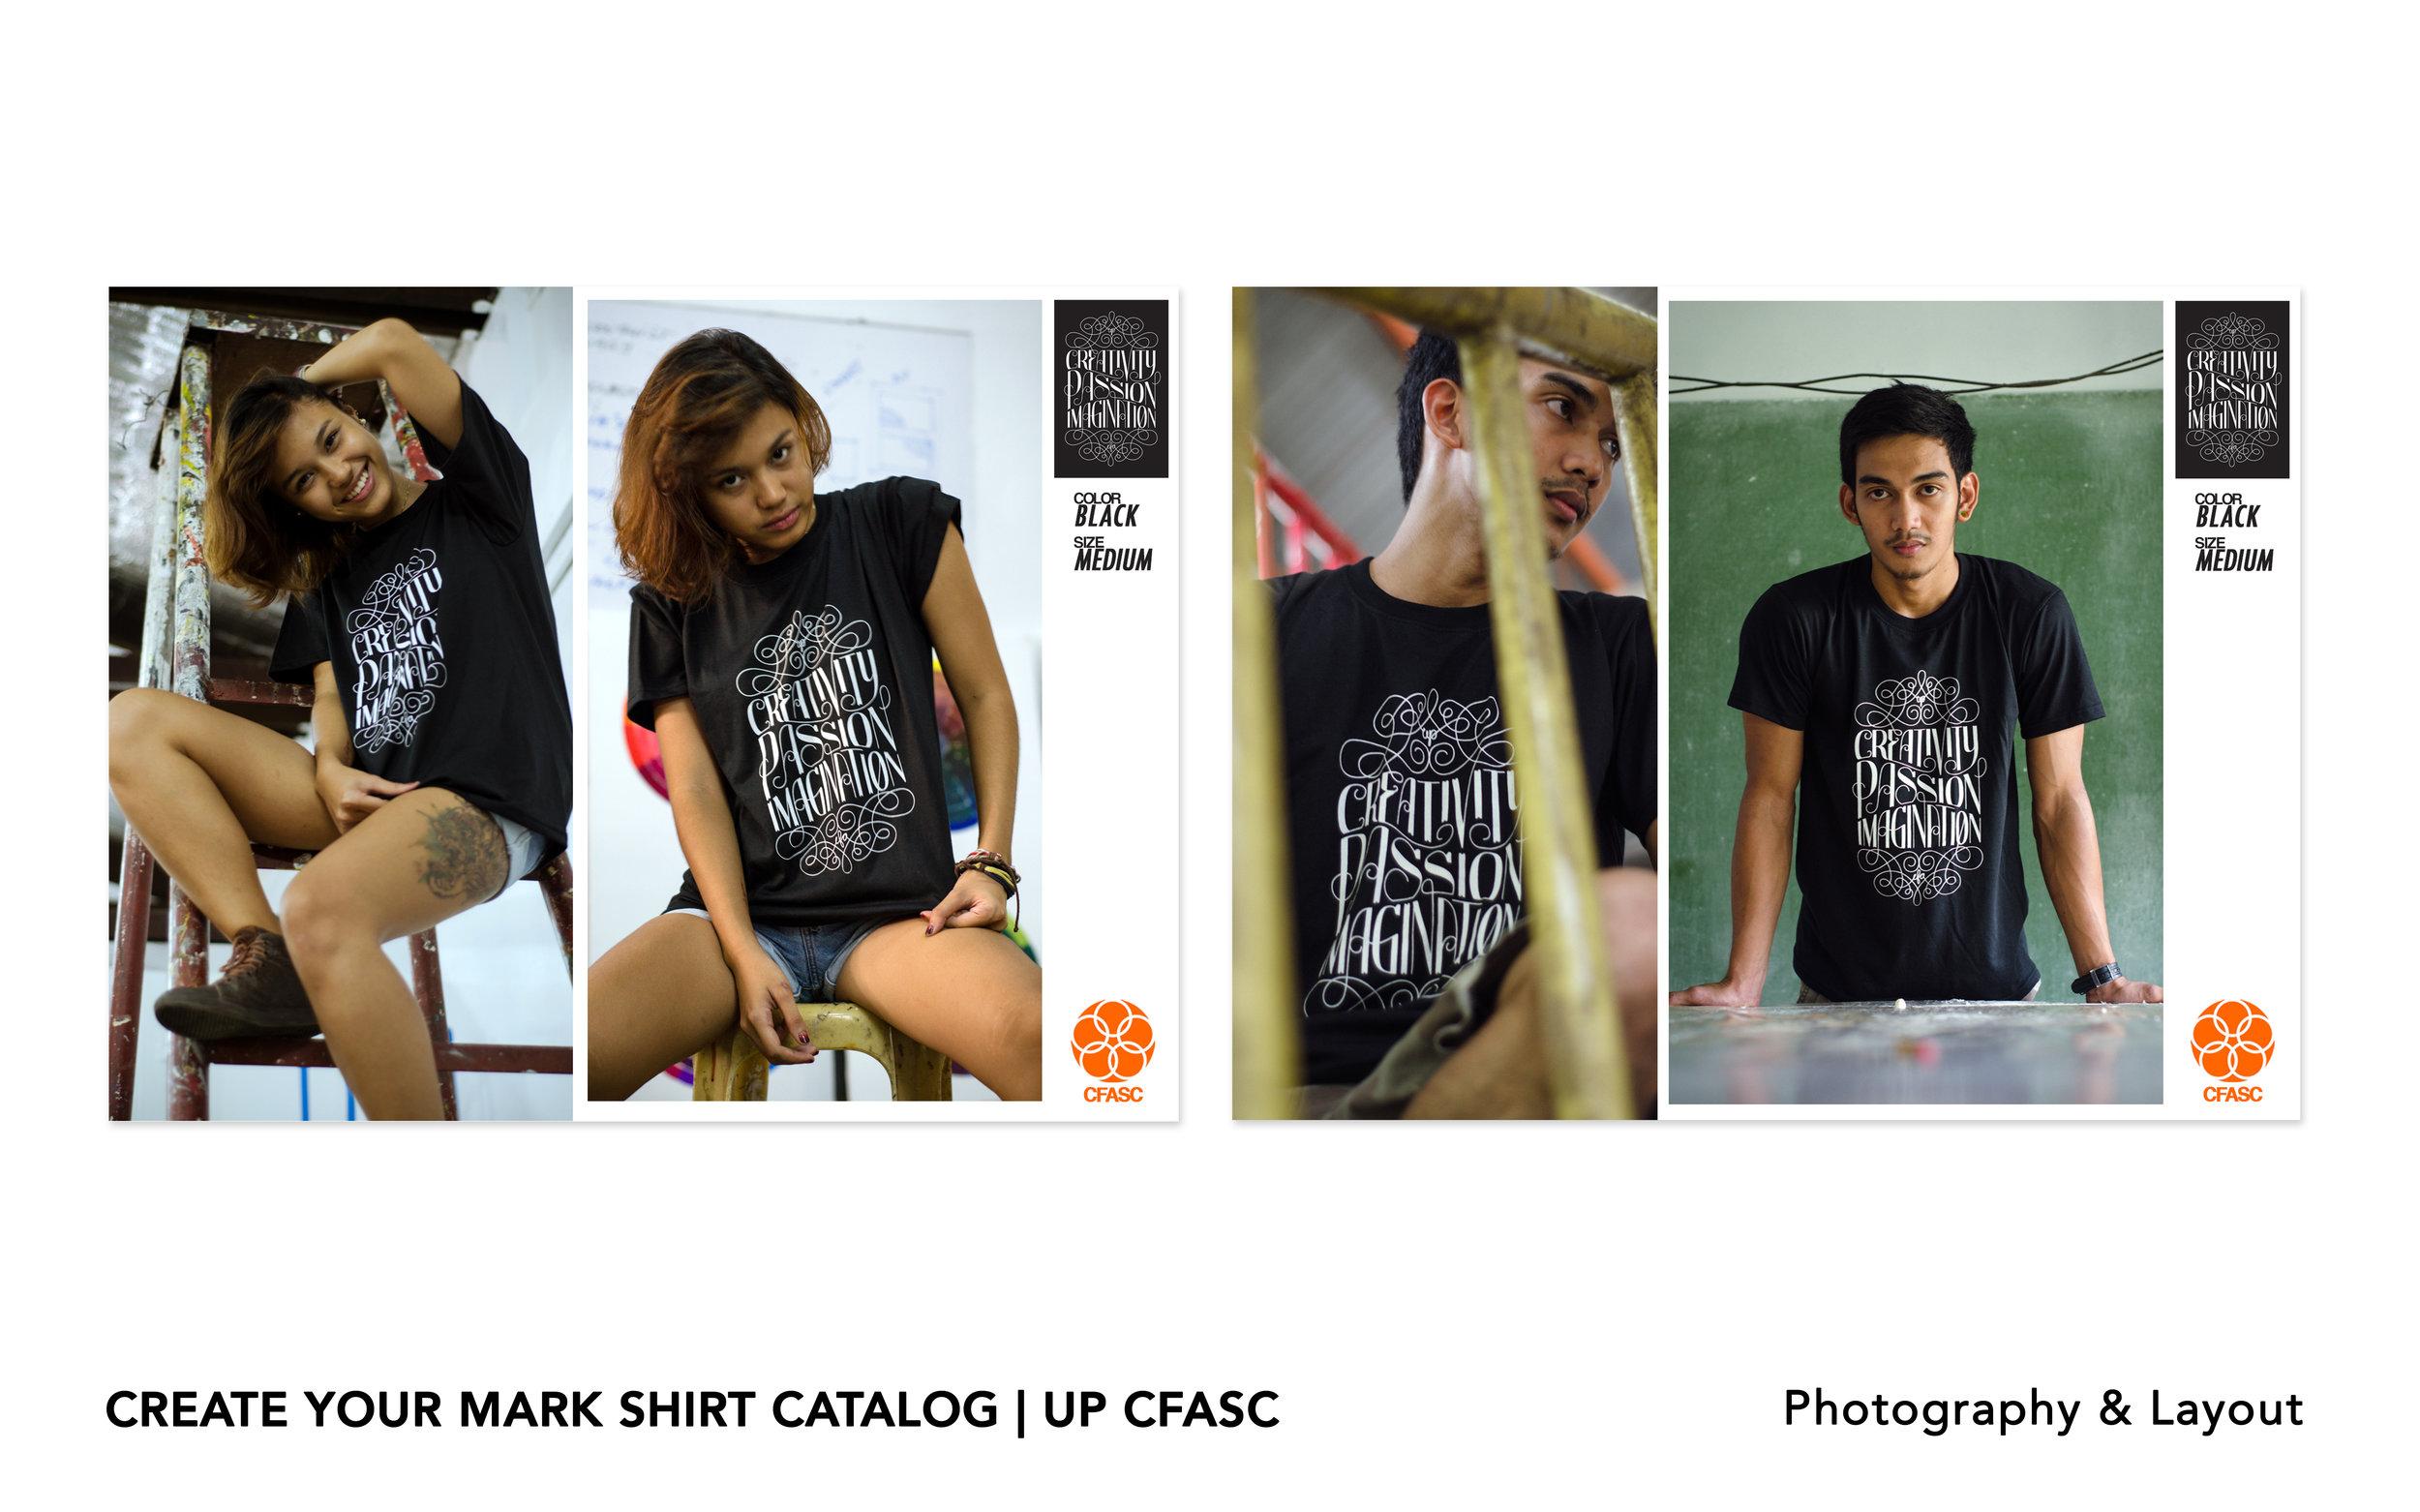 03.2 Create Your Mark Shirt Catalog.jpg